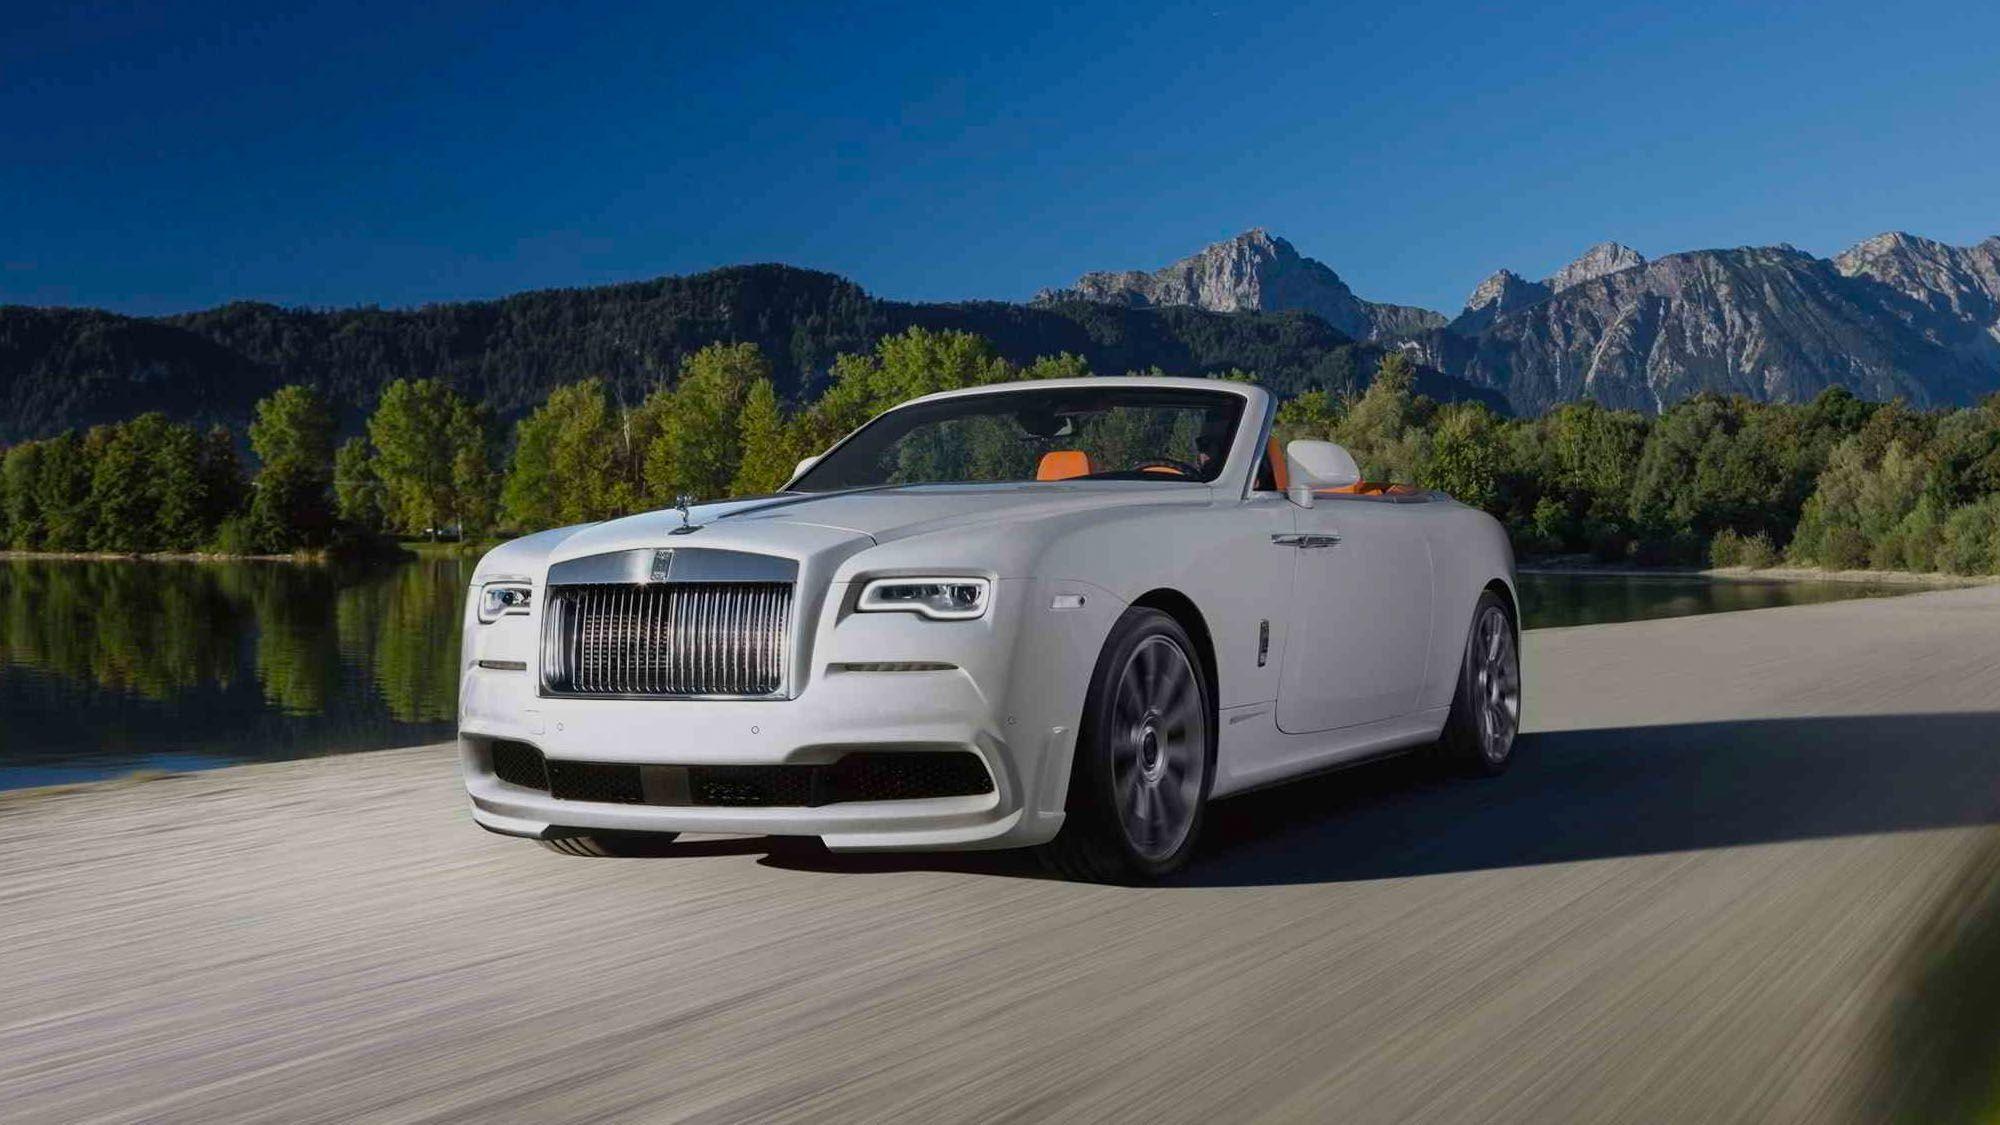 Starr Luxury Cars The Uk S Leading Luxury Car Hire Specialist Rolls Royce Luxury Car Hire Rolls Royce Dawn